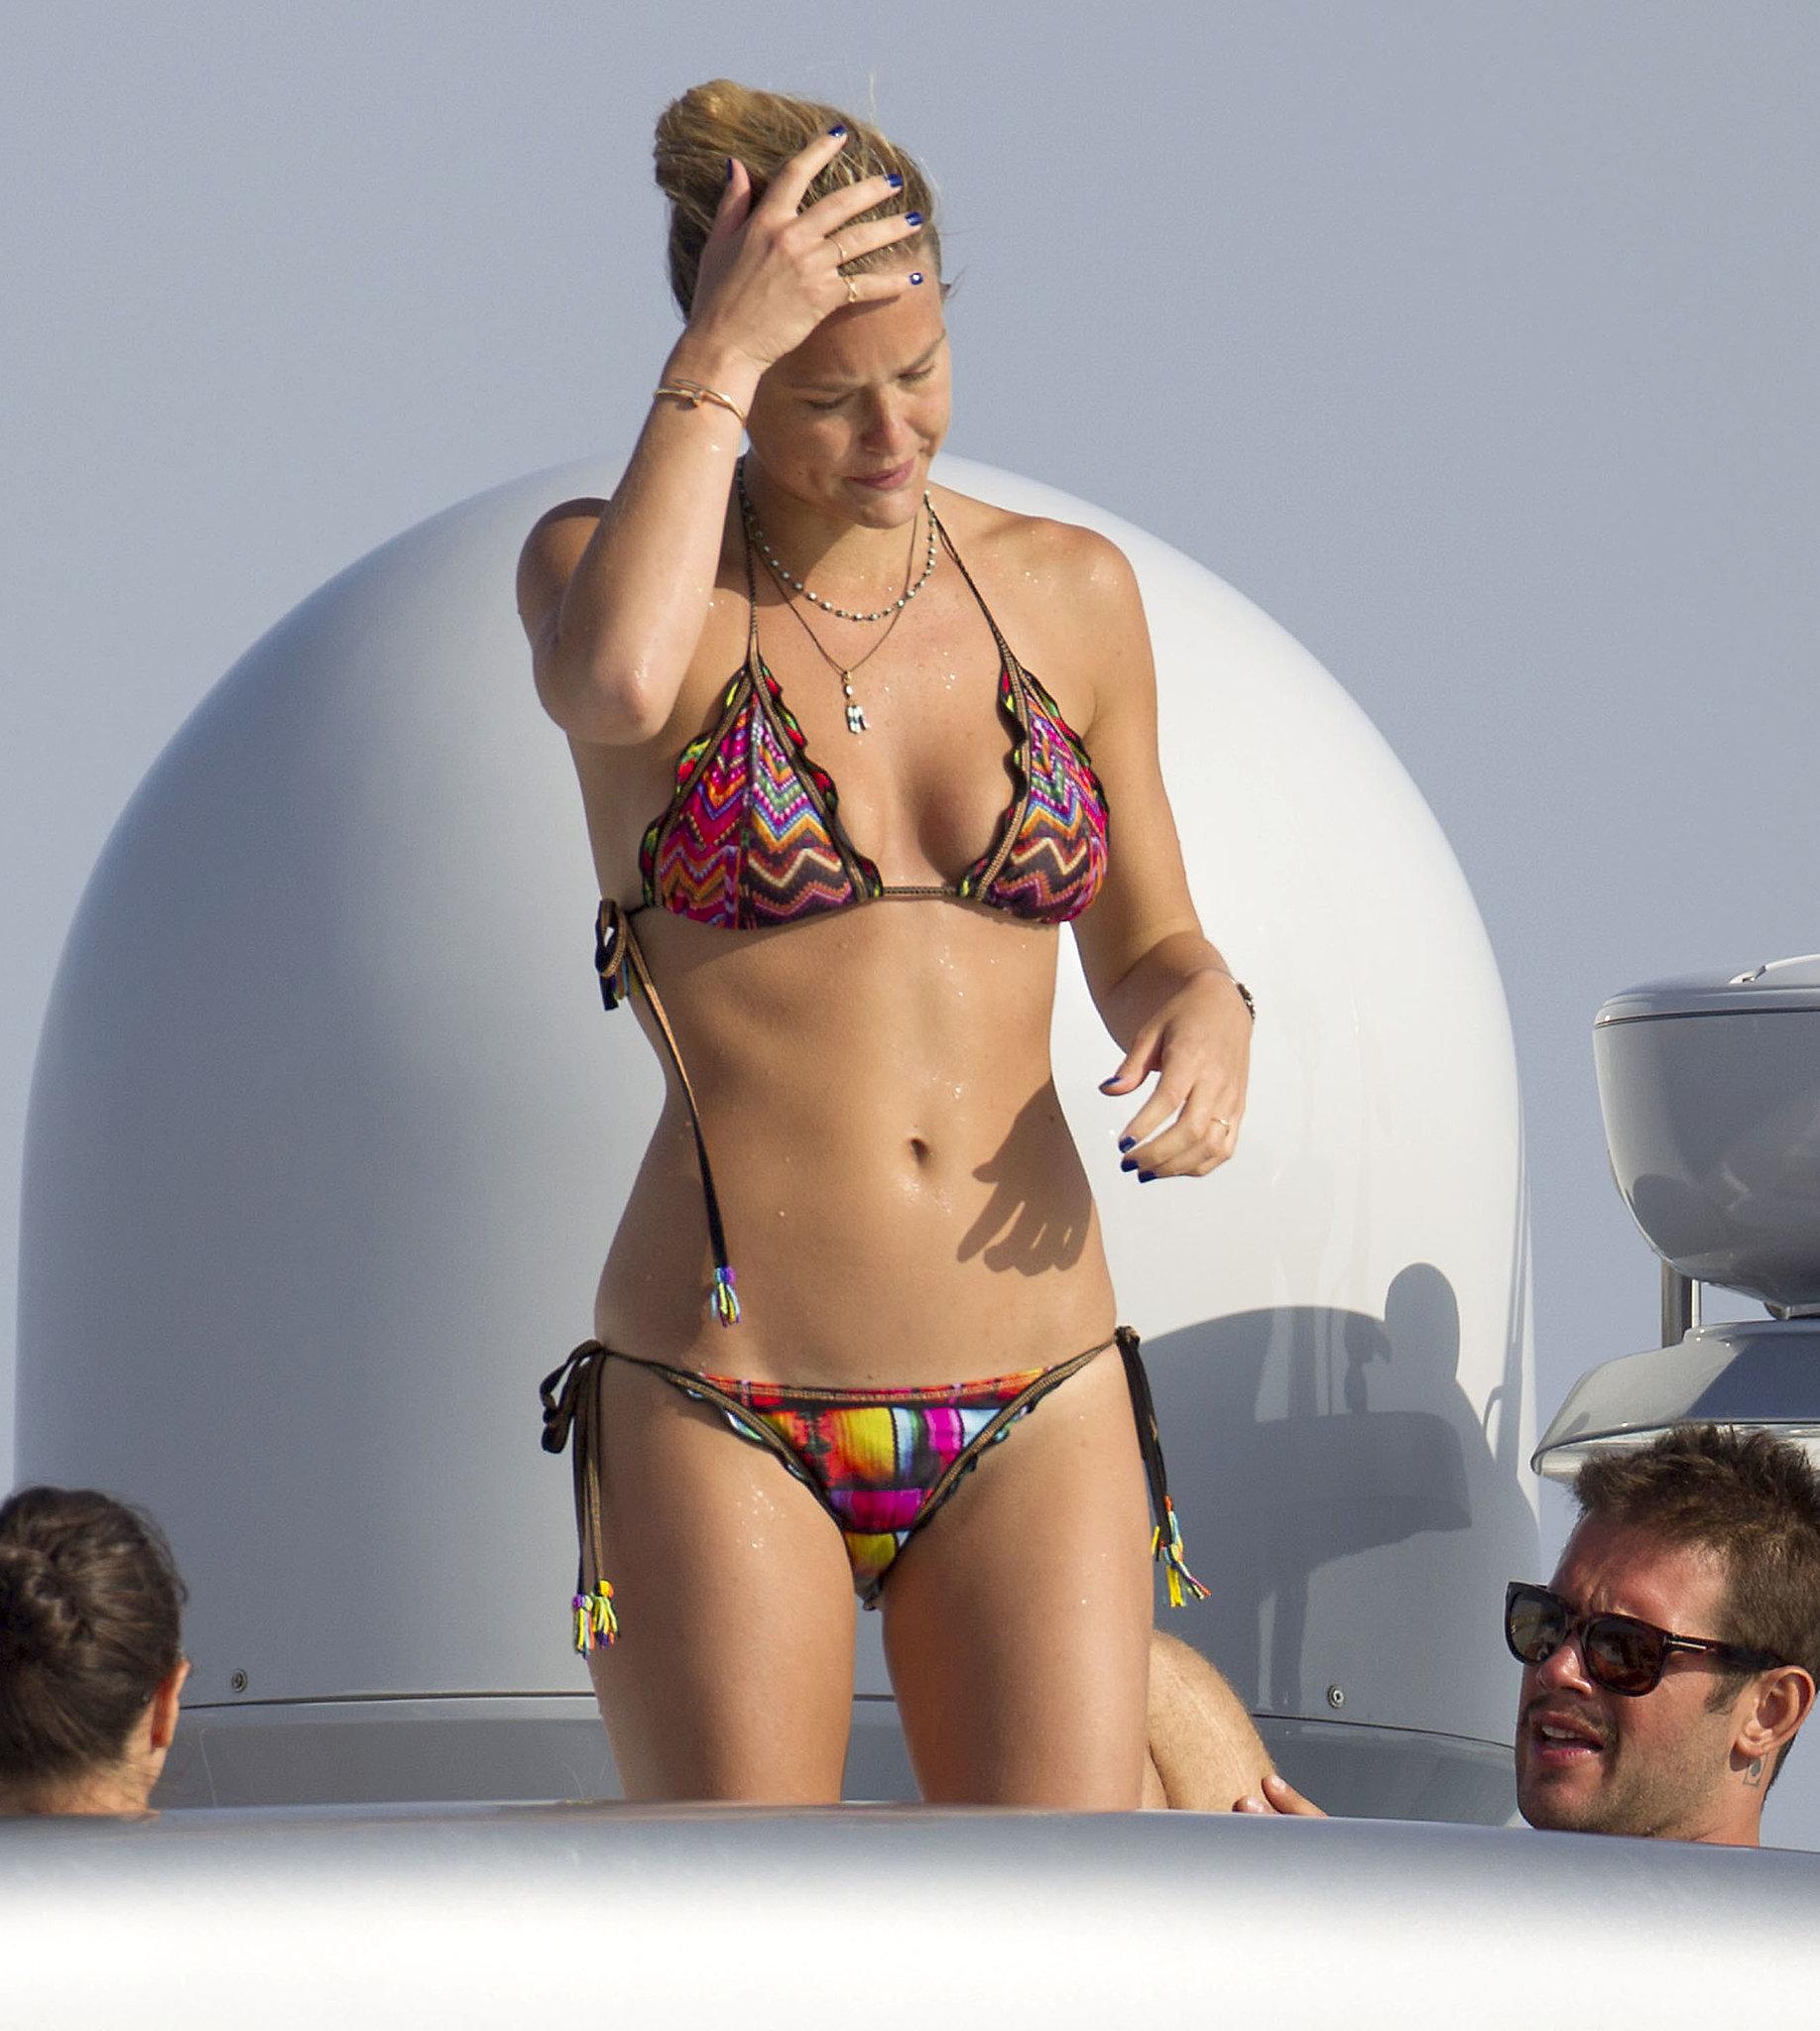 Bikini-Clad Bar Refaeli Shows Off Her Six-Pack in Spain